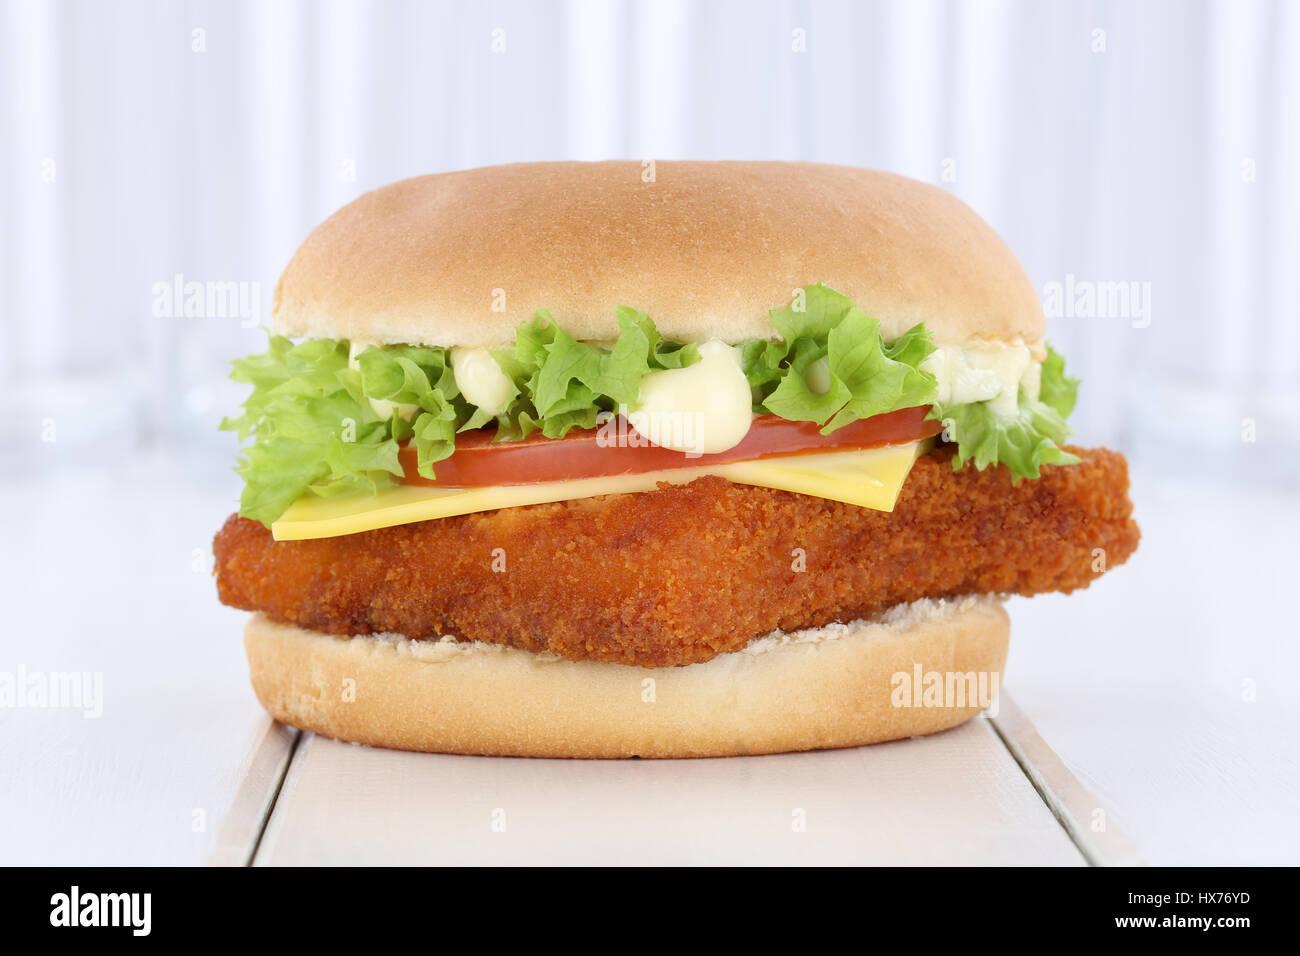 Fish burger fishburger hamburger fresh tomatoes lettuce cheese onion - Stock Image